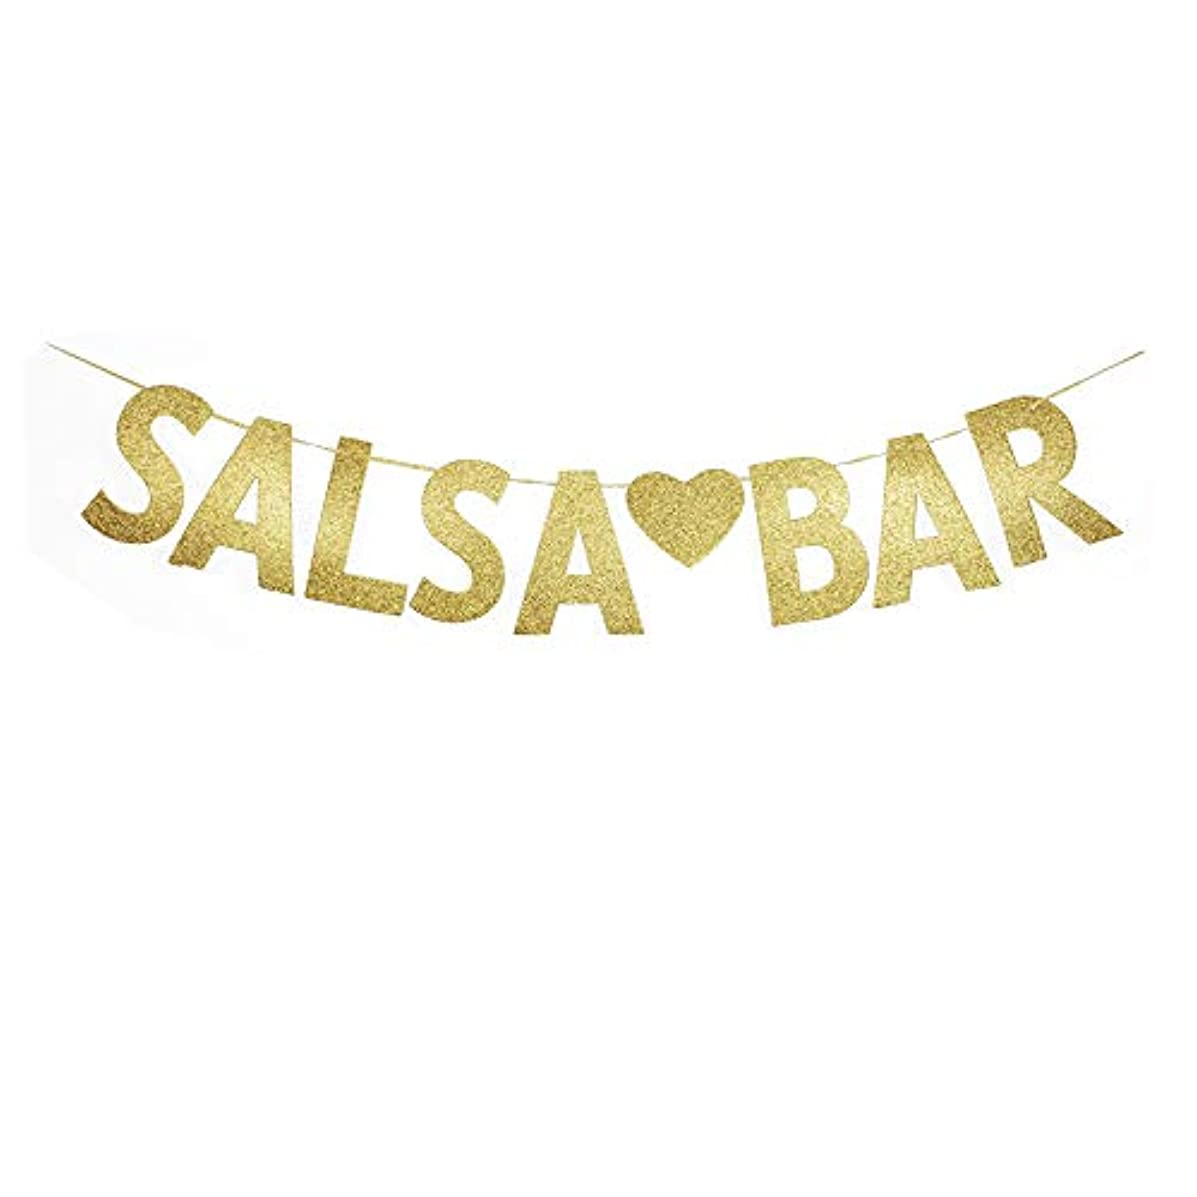 Salsa Bar Gold Gliter Paper Banner, Birthday/Bachelorette/Wedding/Engagament Party Decorations